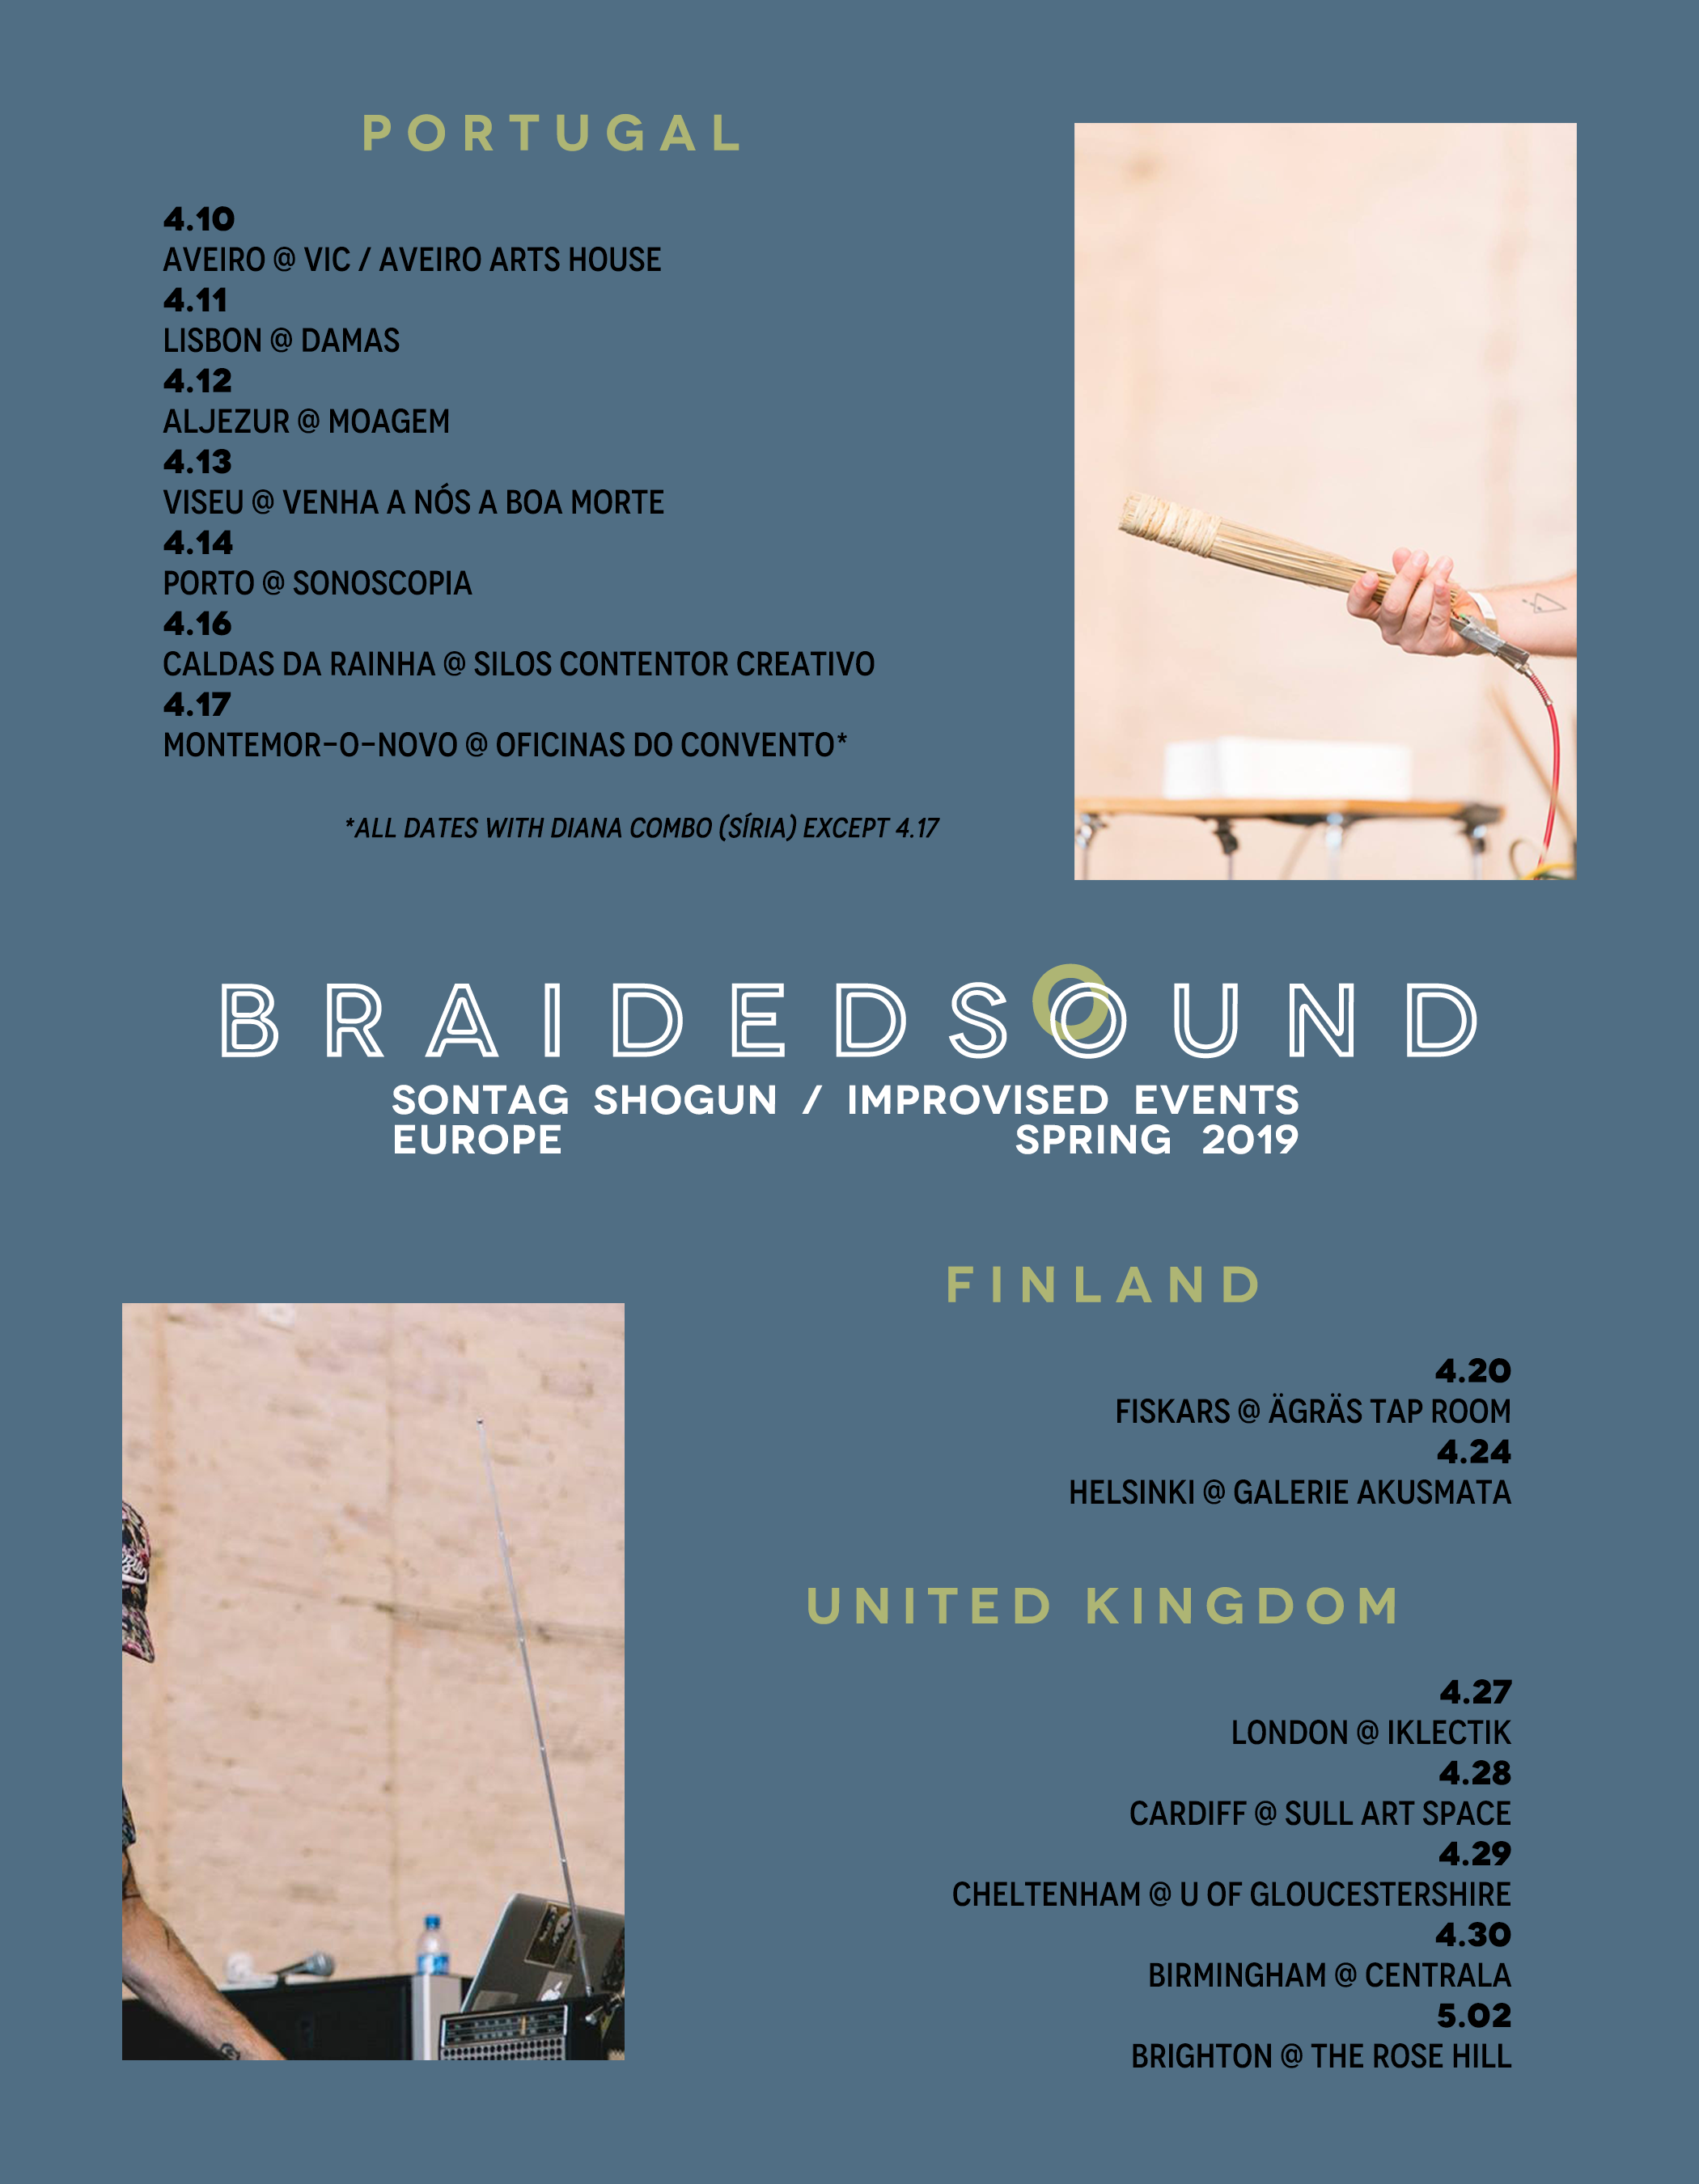 braidedsound europe 2019 dates.png